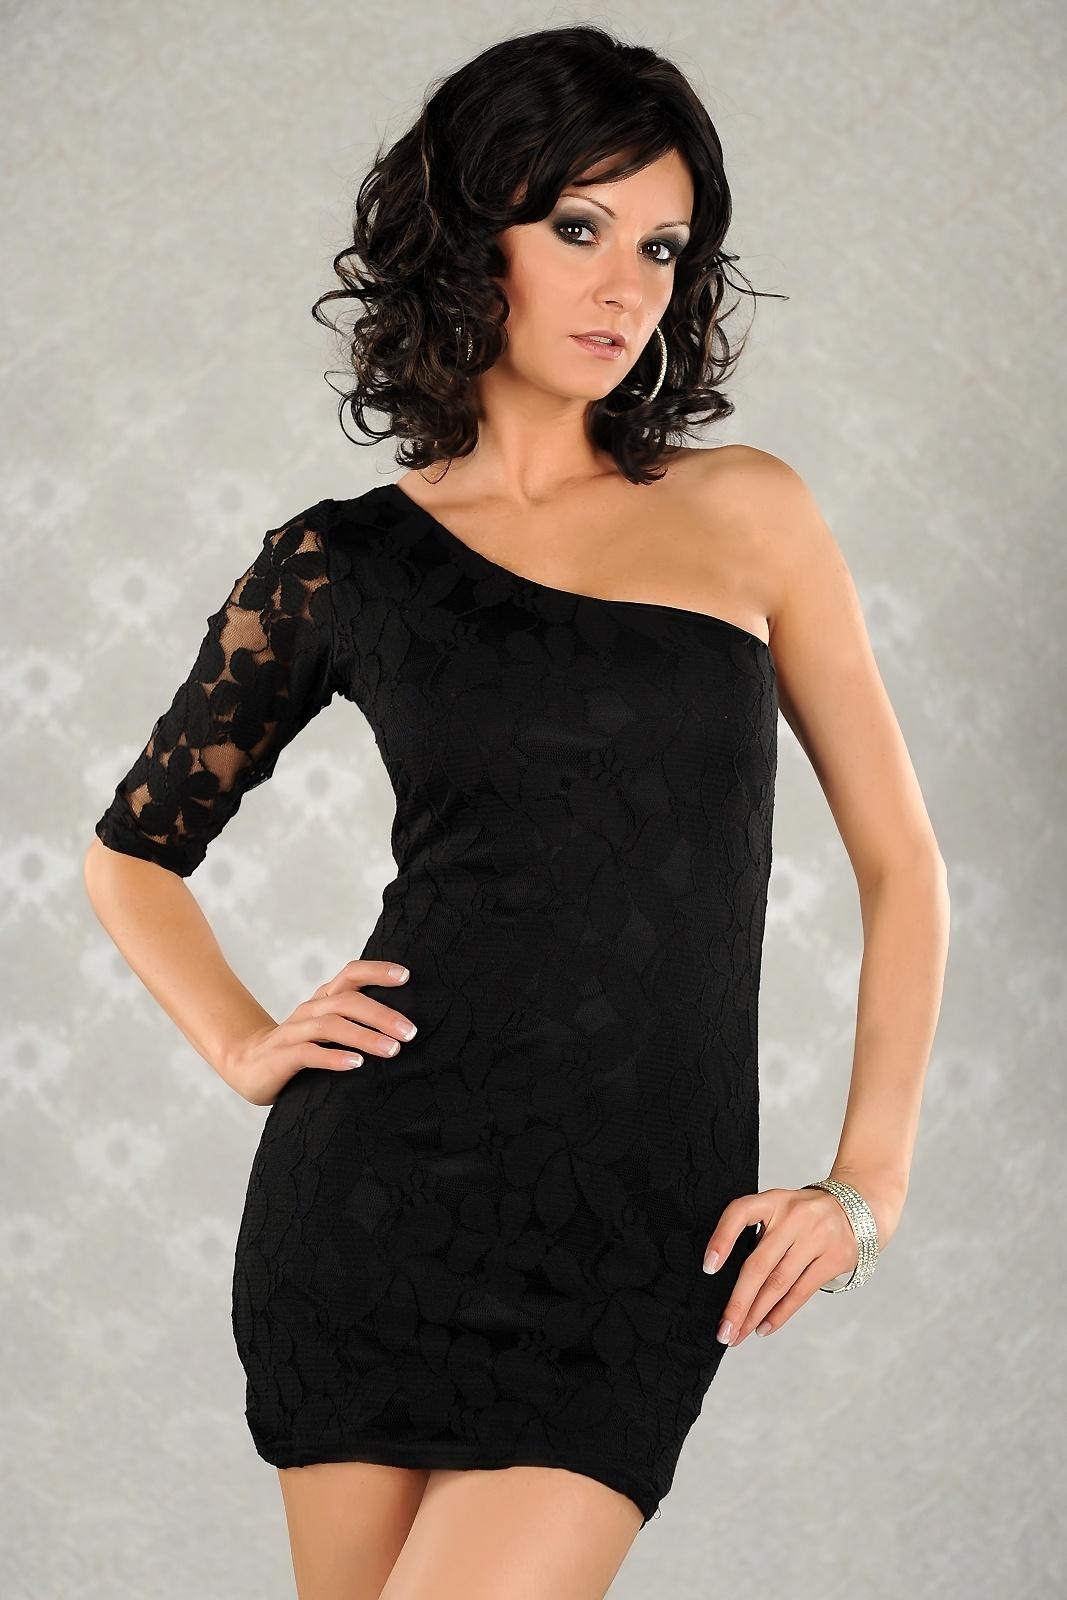 f69e6c4602  MB29  Czarna sukienka koronkowa na jedno ramię